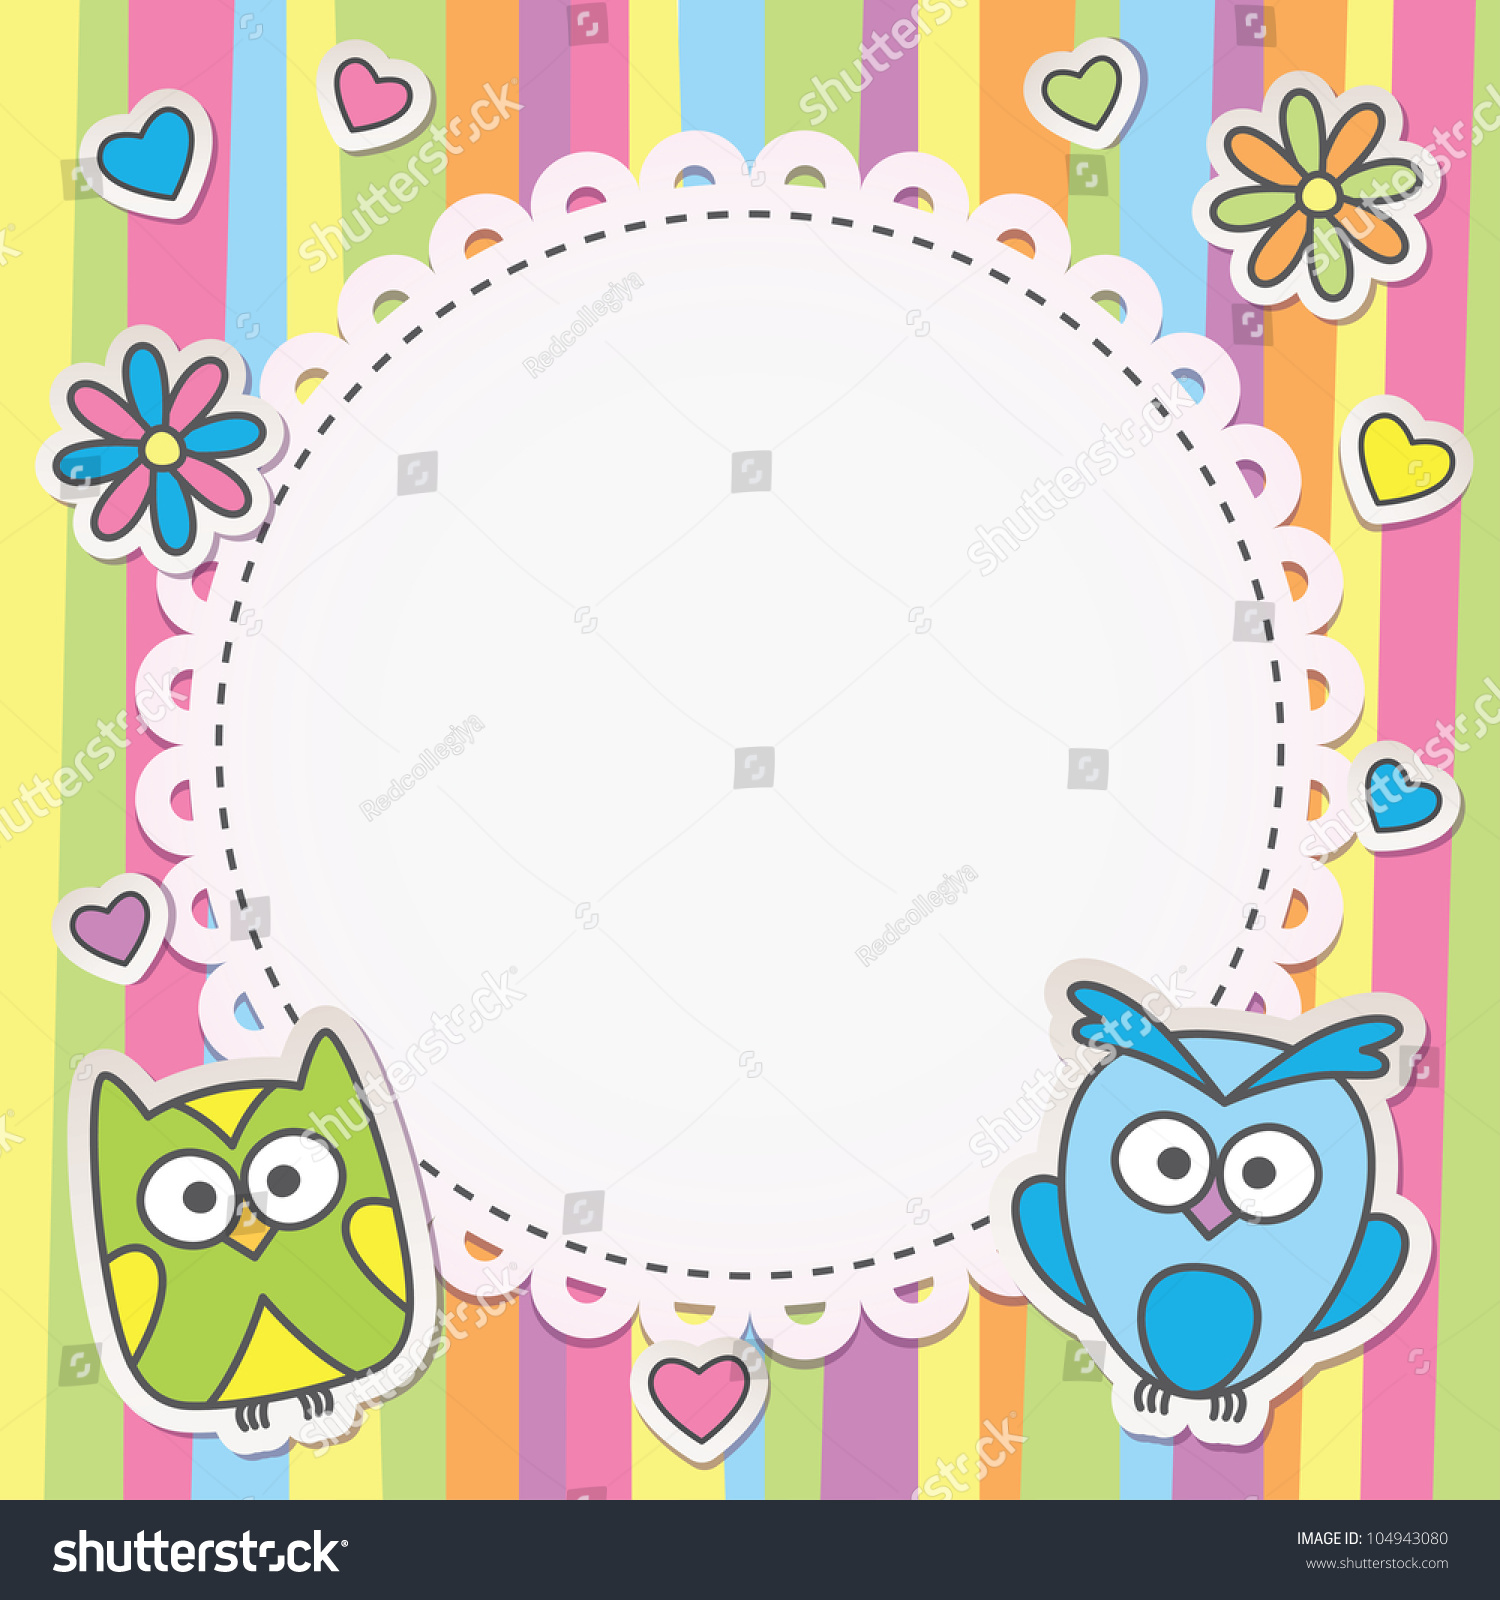 Cute Frame Cartoon Owls On Striped Stock Vector 104943080 - Shutterstock